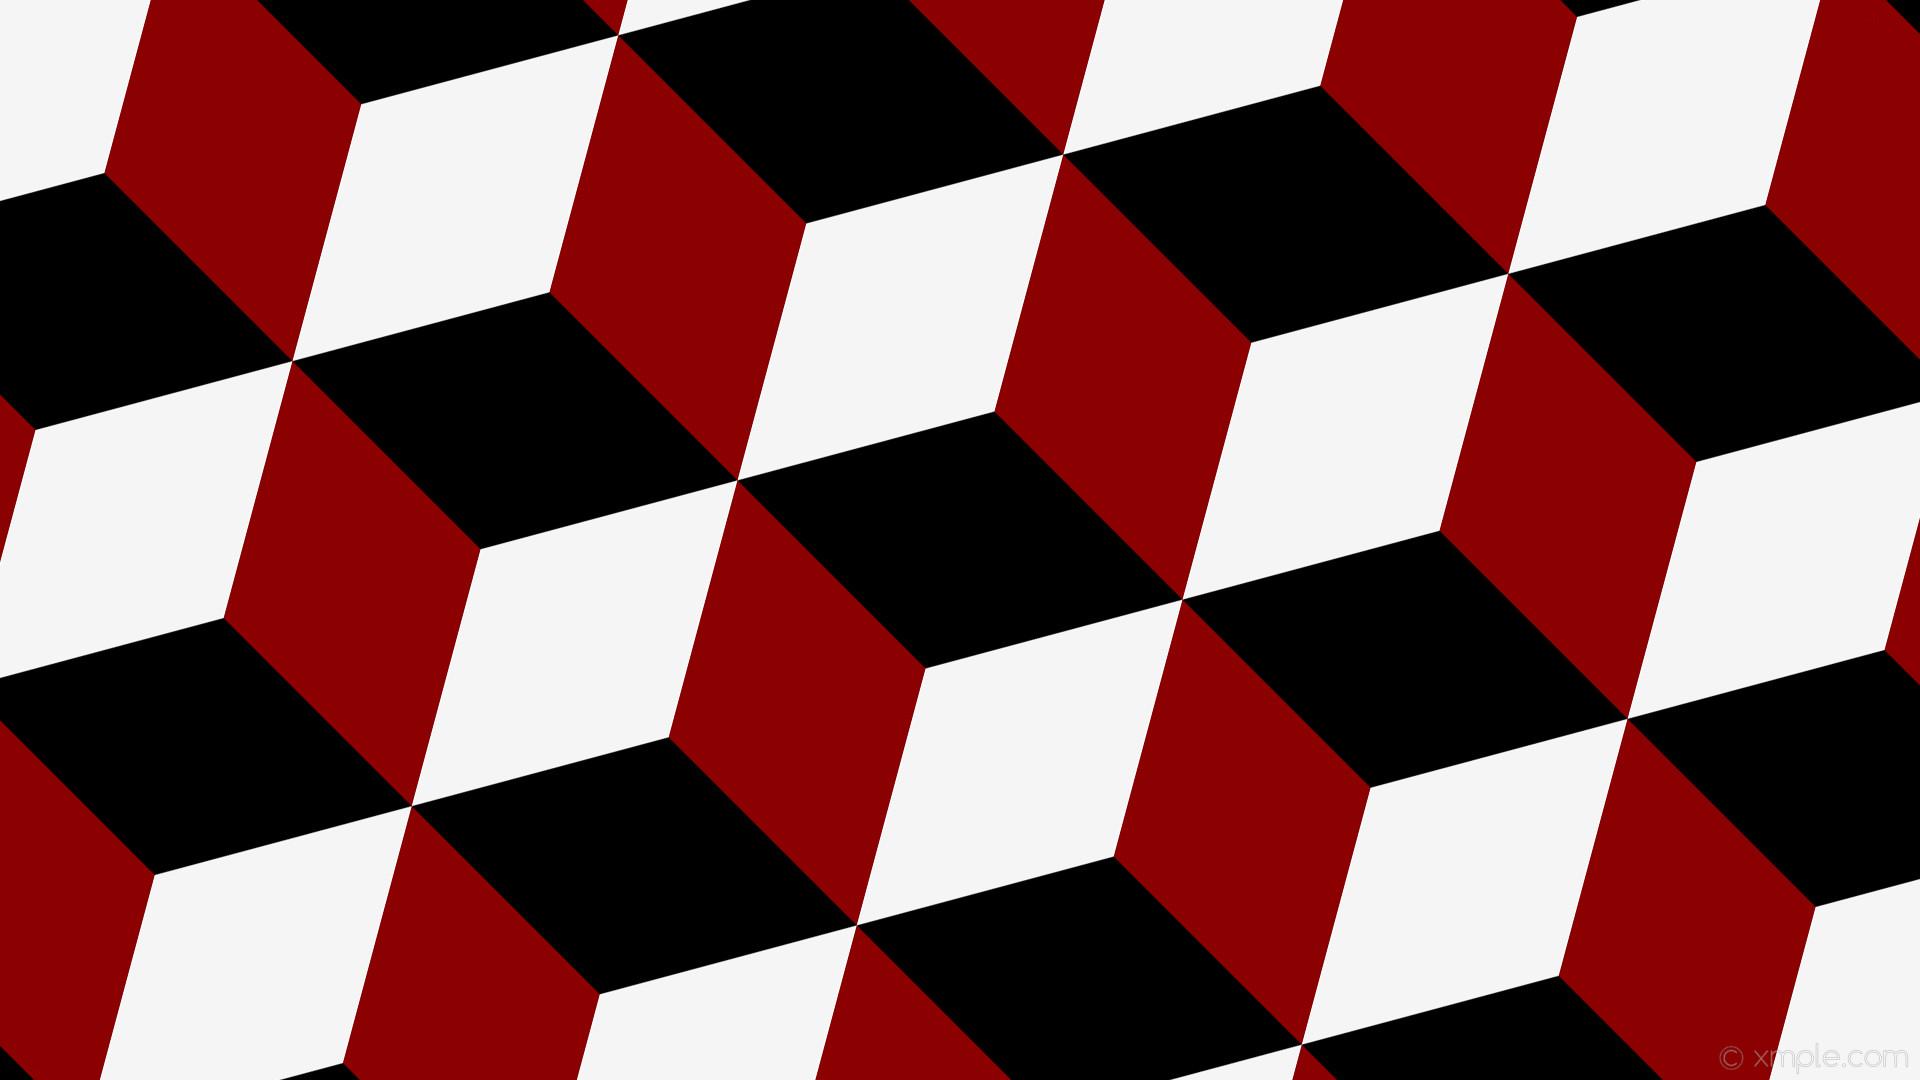 1920x1080 wallpaper red 3d cubes white black dark red white smoke 000000 8b0000 - Red White Wallpaper